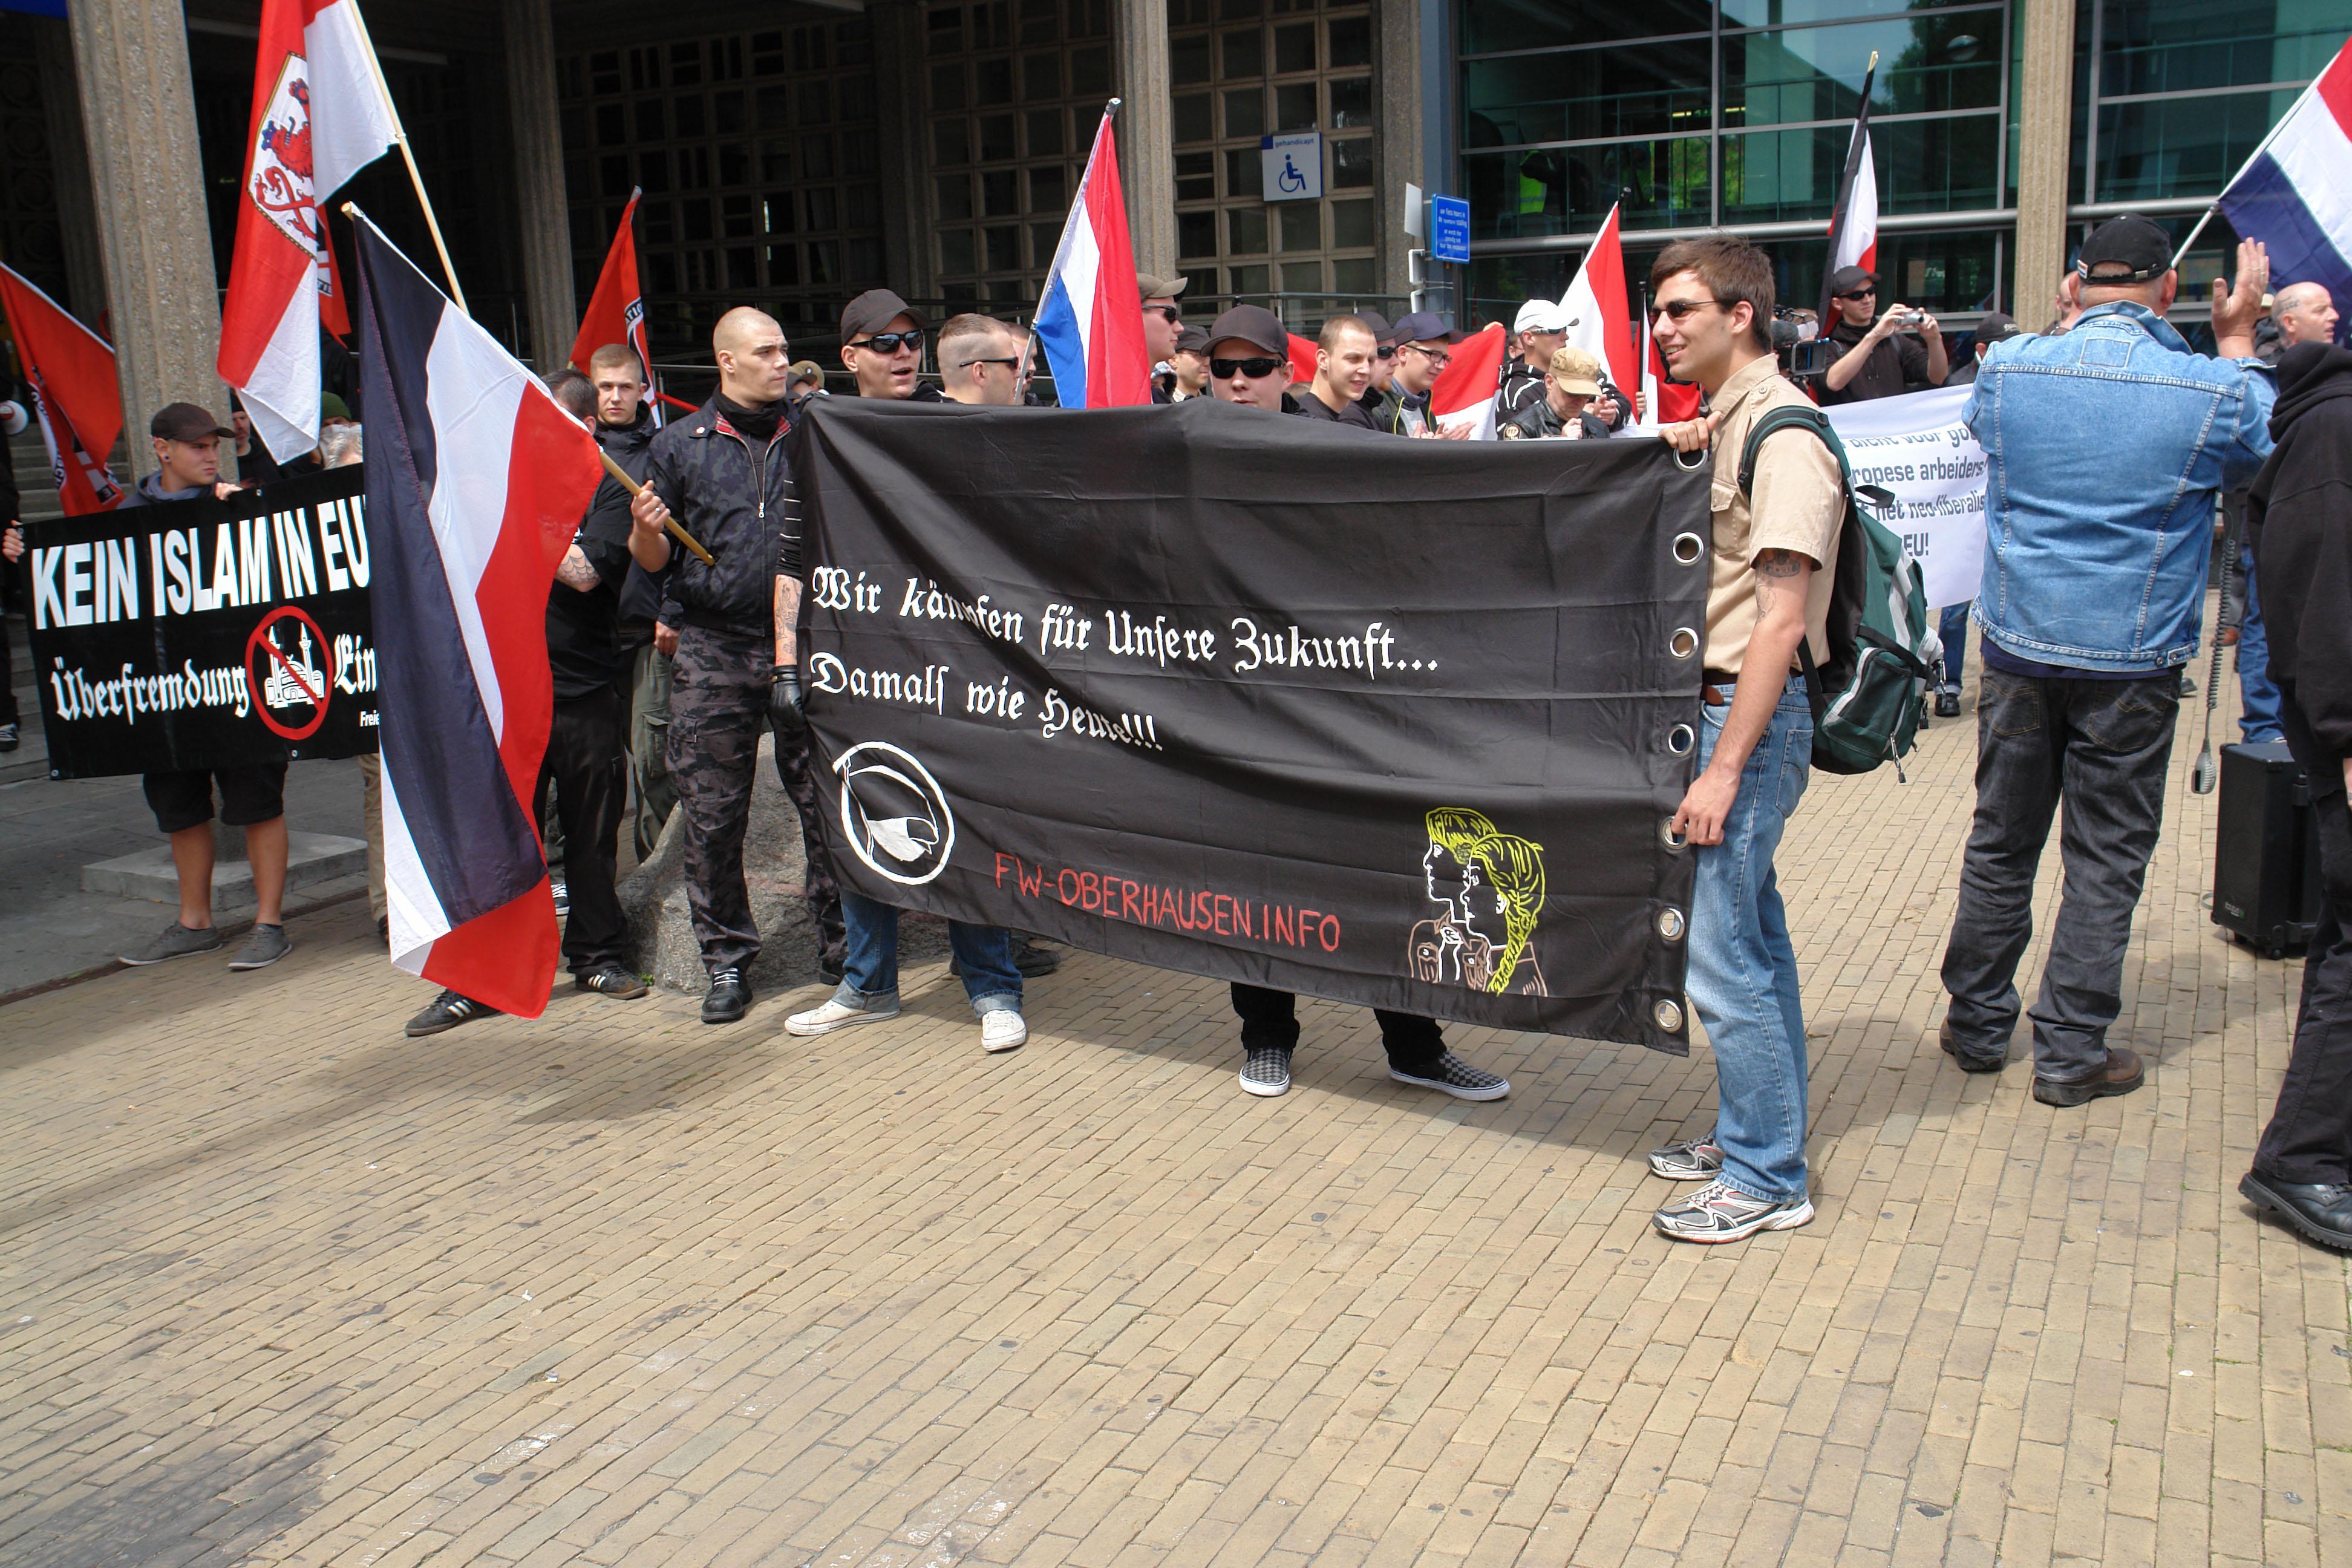 Petri & Leisering in den Niederlanden - 2011